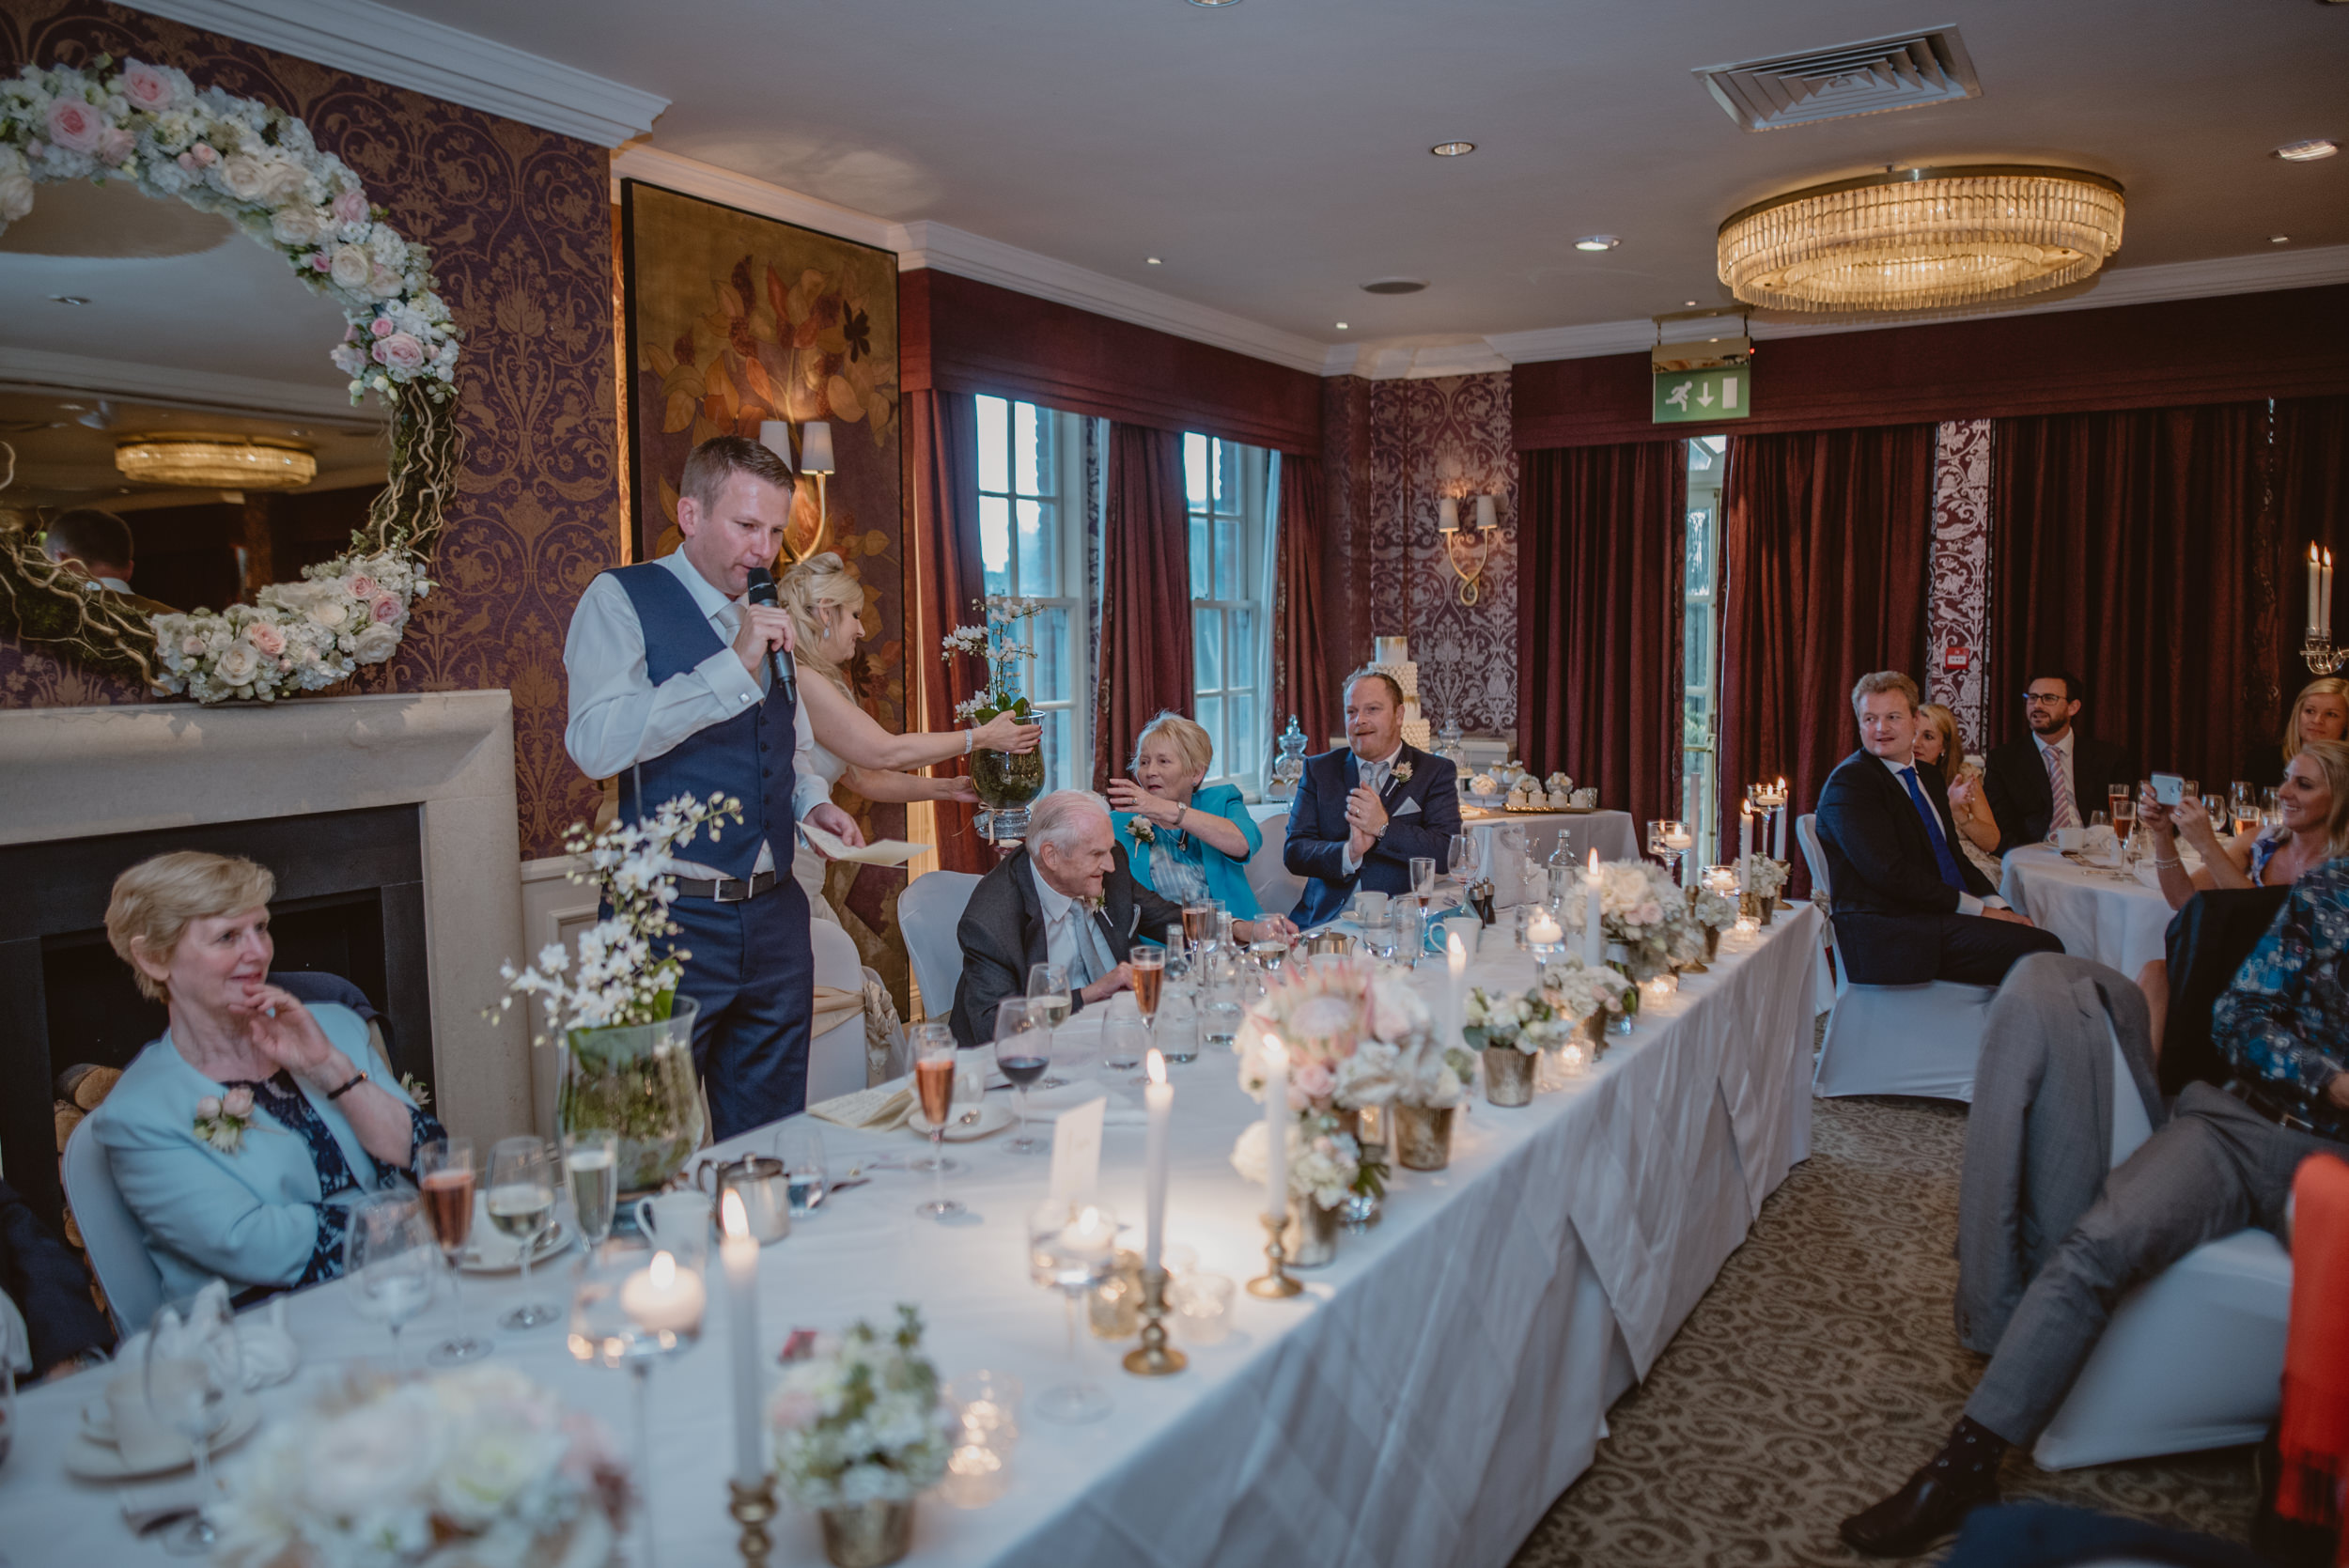 Trisha-and-Roger-wedding-The-Priory-Church-and-Chewton-Glen-Hotel-Christchurch-Manu-Mendoza-Wedding-Photography-424.jpg